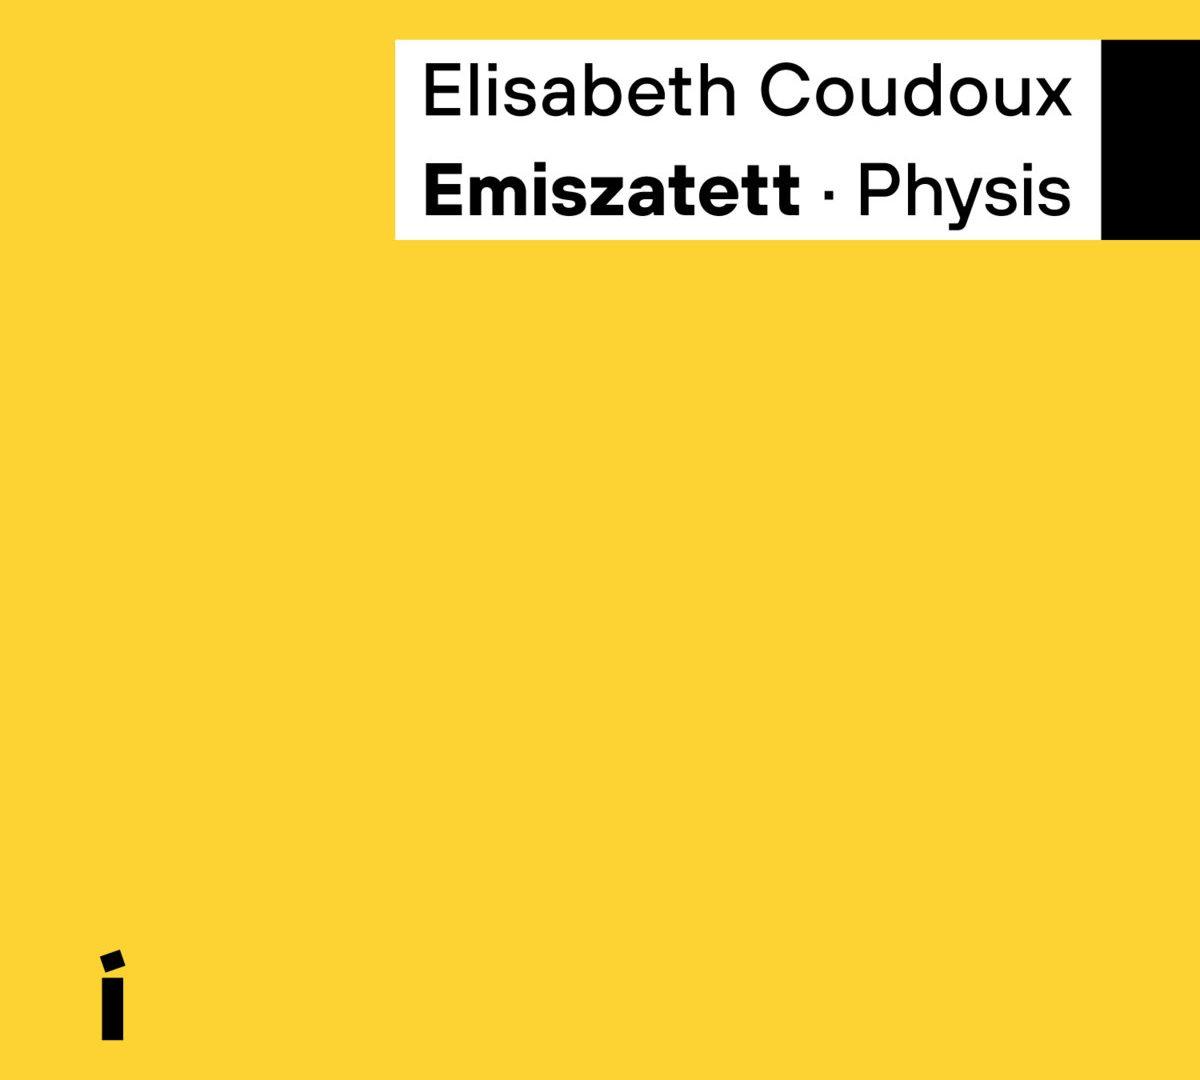 Elisabeth Coudoux Emiszatett Physis Matthias Muche Robert Landfermann Philip Zoubek Etienne Nillesen LOFT Cologne Köln recorded Christian Heck